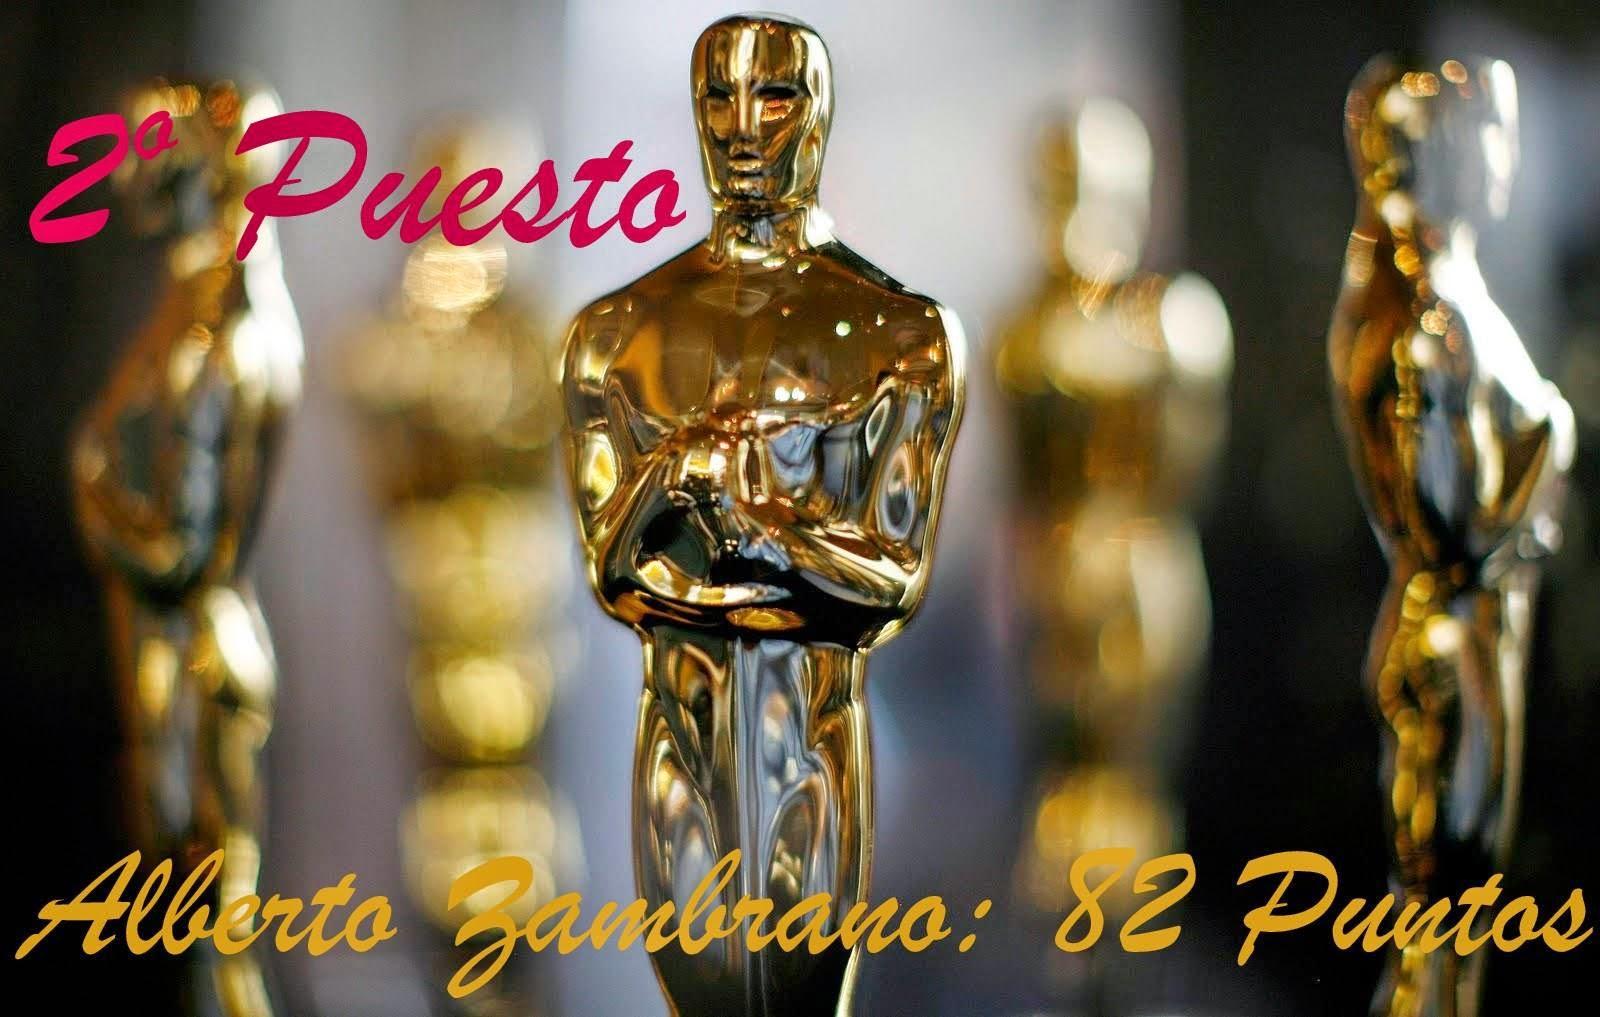 Segundo Lugar: Nostradamus de los Oscar 2014